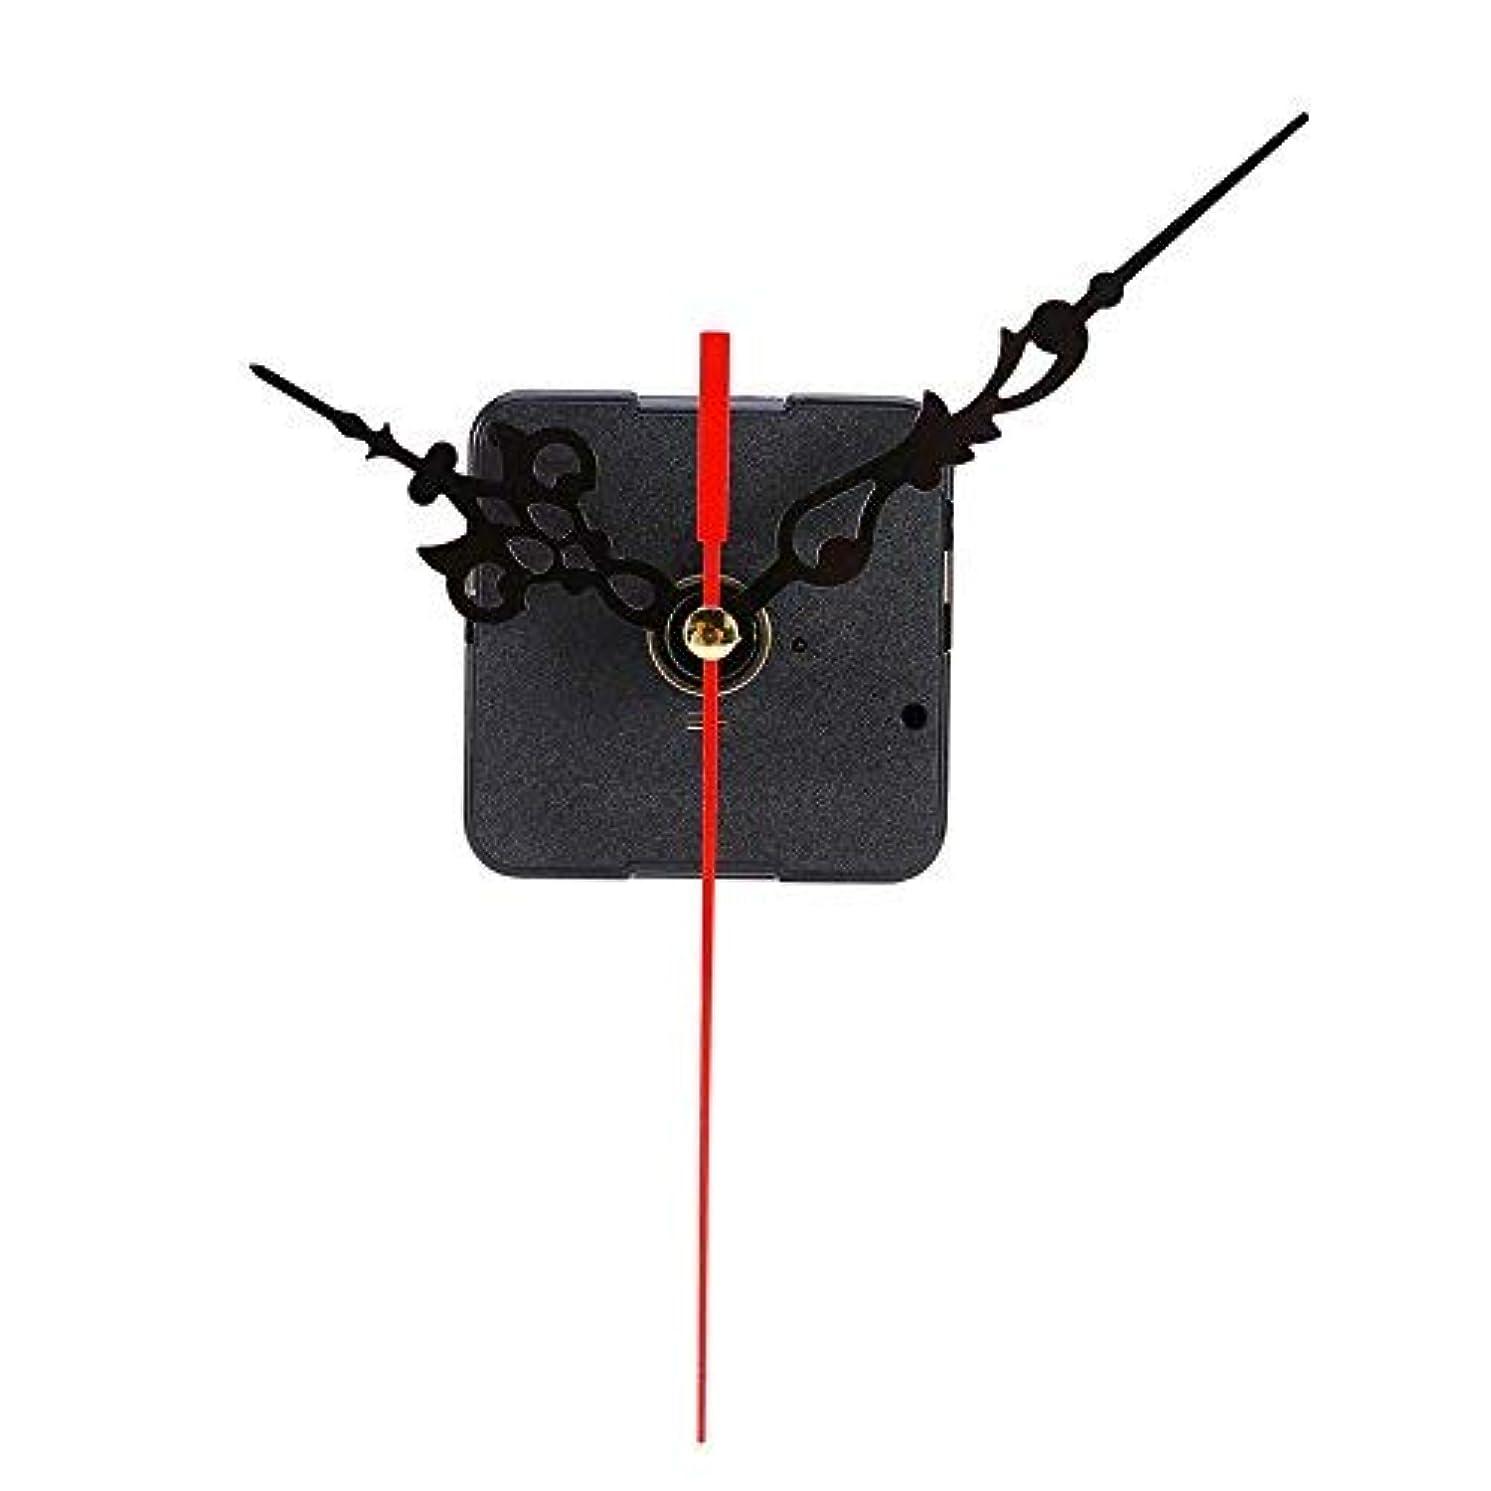 GLOGLOW Silence Quartz Clock Movement Mechanism High Torque Continuous-Sweep Mini Quartz Movement Shaft Length Continuous Sweep Quartz Clock Movement Replacement